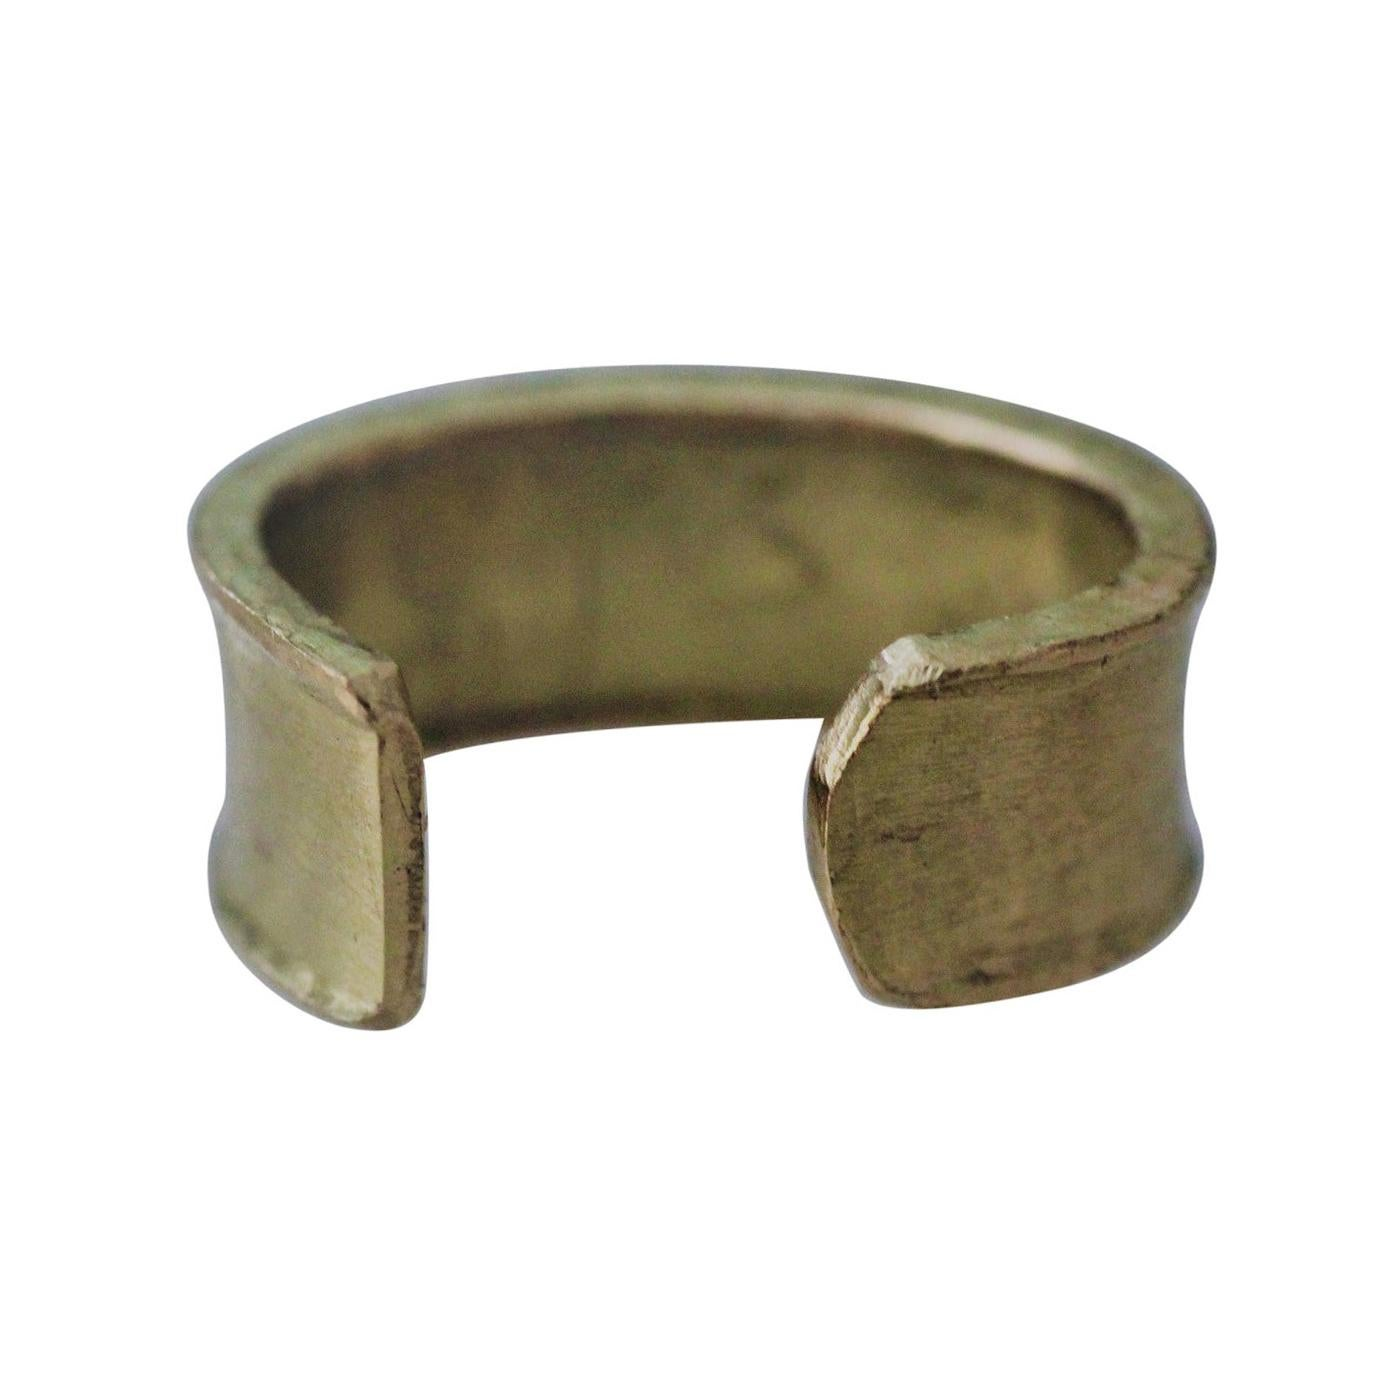 Single 18 Karat Gold Cuff Earring Clip-On Handmade Minimalist Modern Sculpture